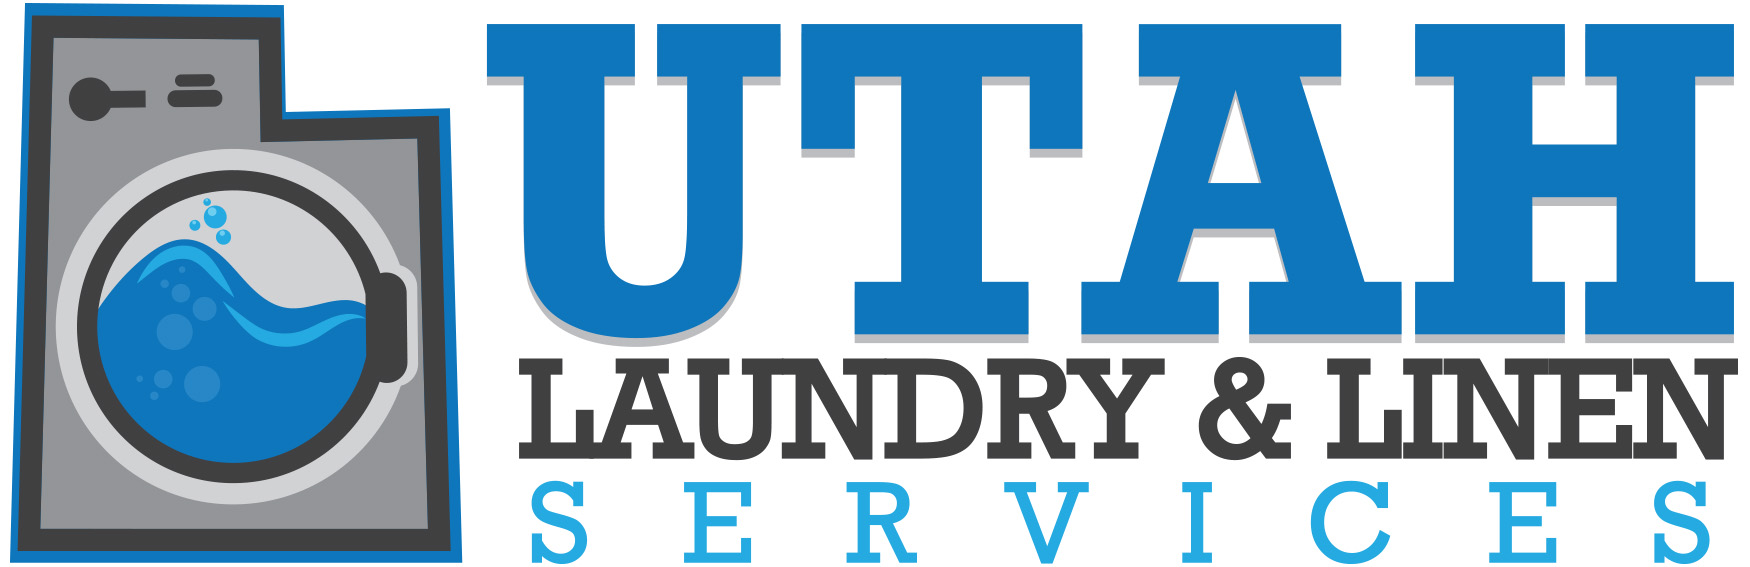 UTAH Laundry